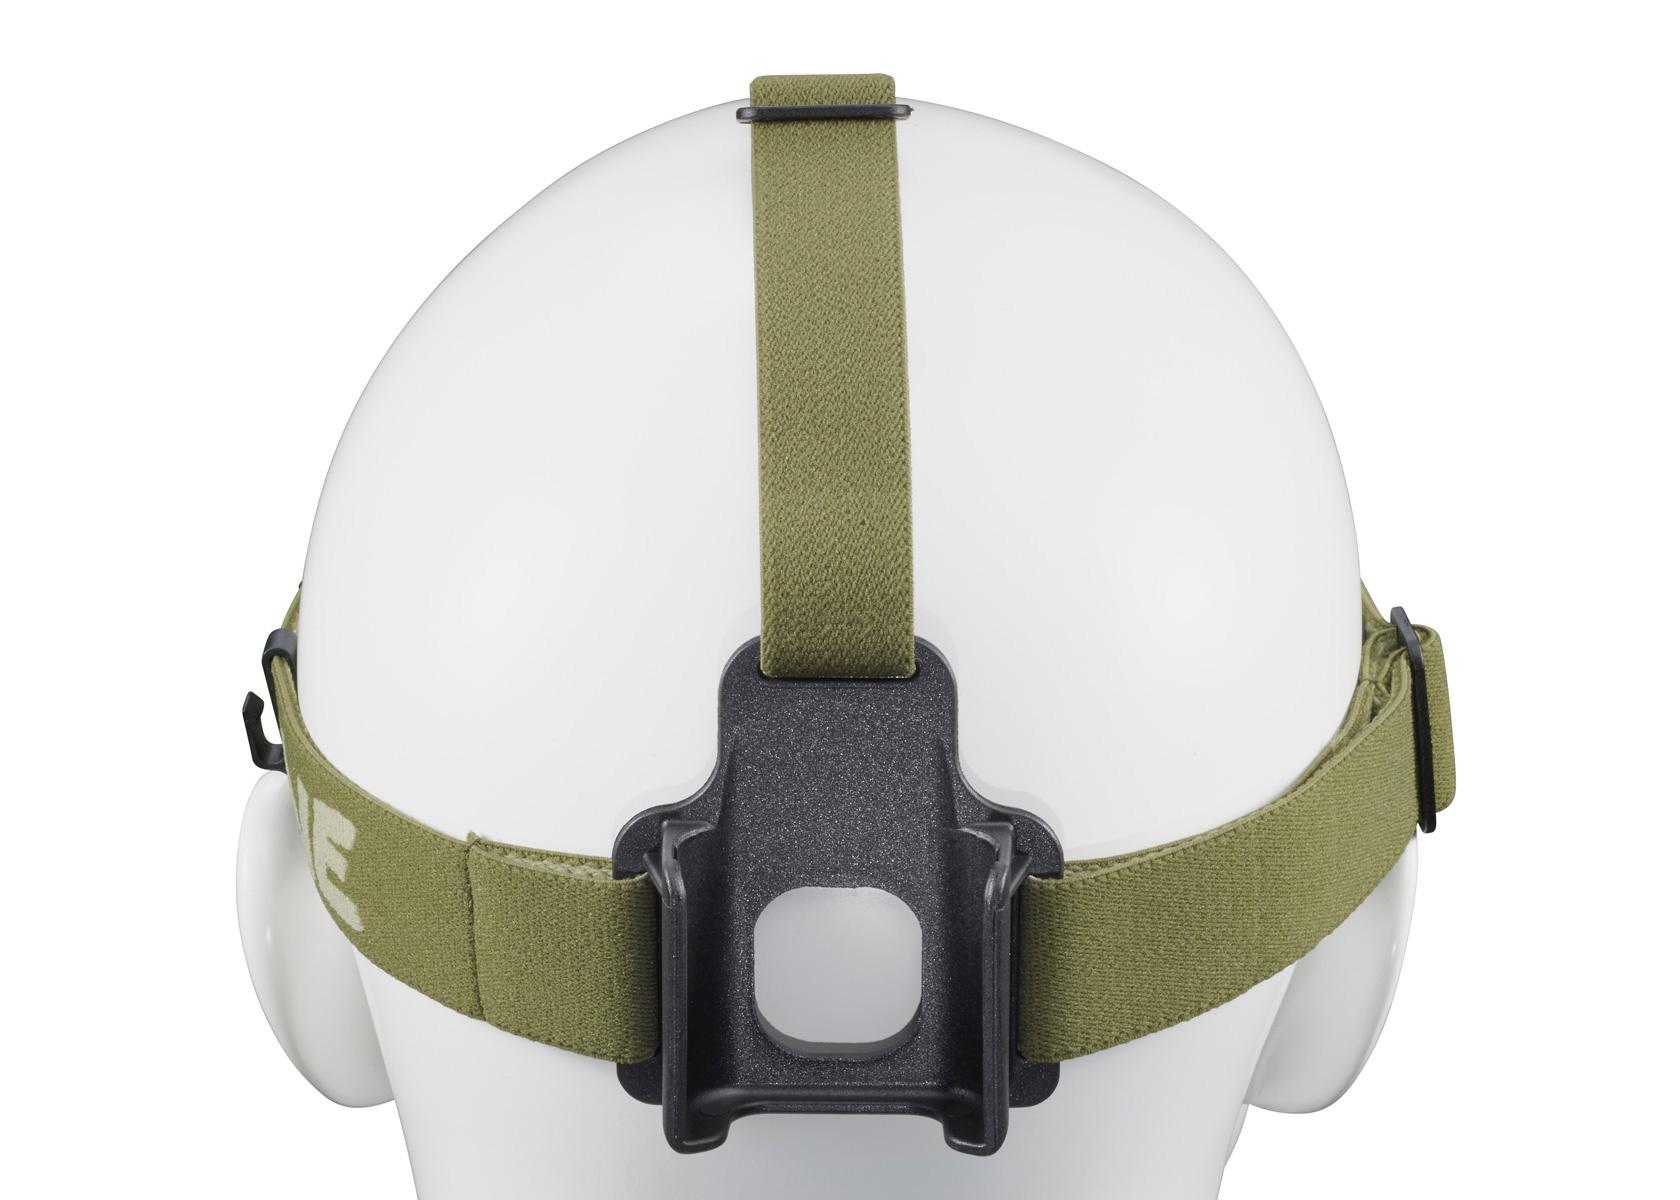 Stirnband FrontClick Neo/Piko/Blika oliv